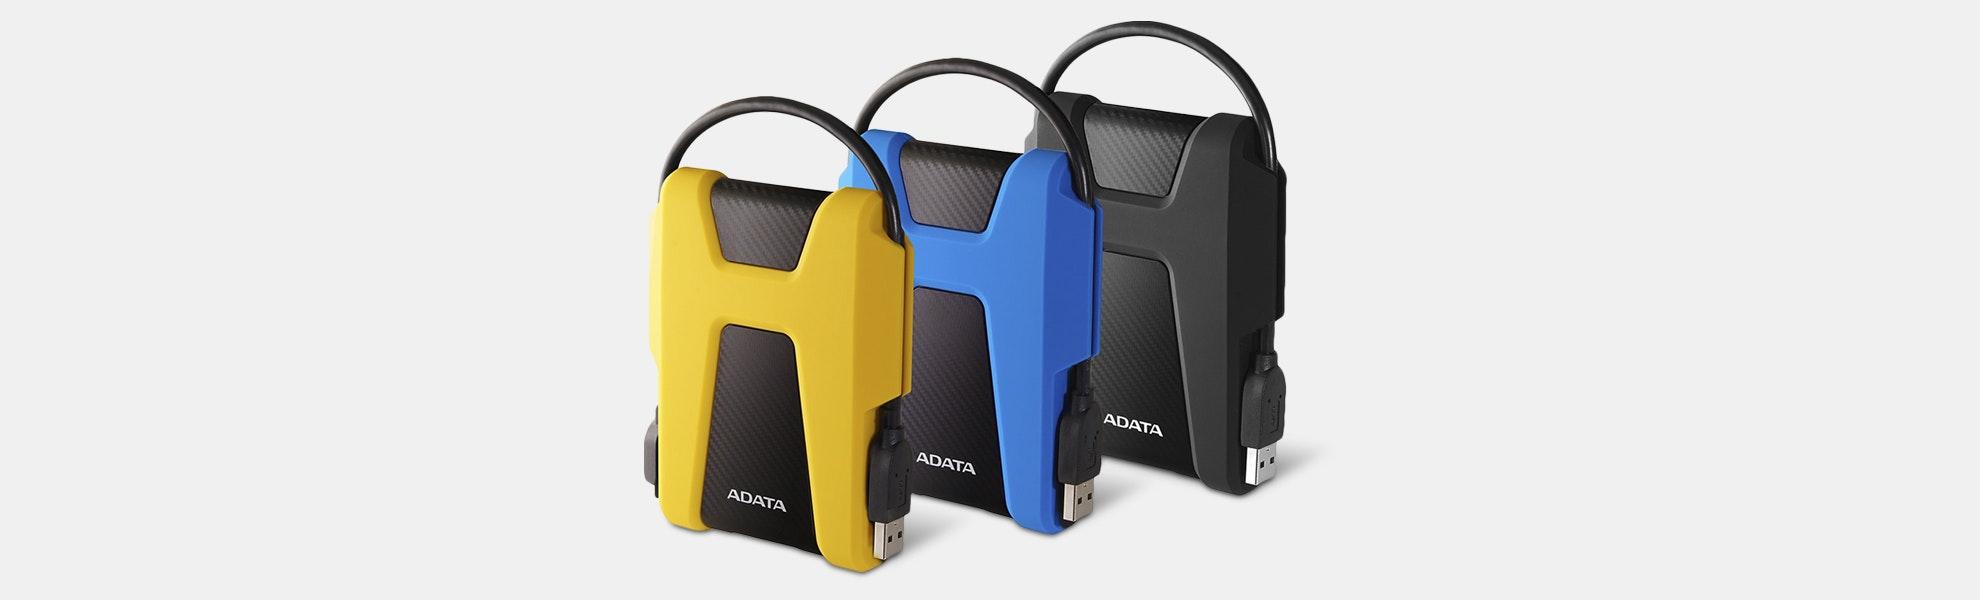 ADATA HD680 AES 256-Bit Encryption HDD Drive